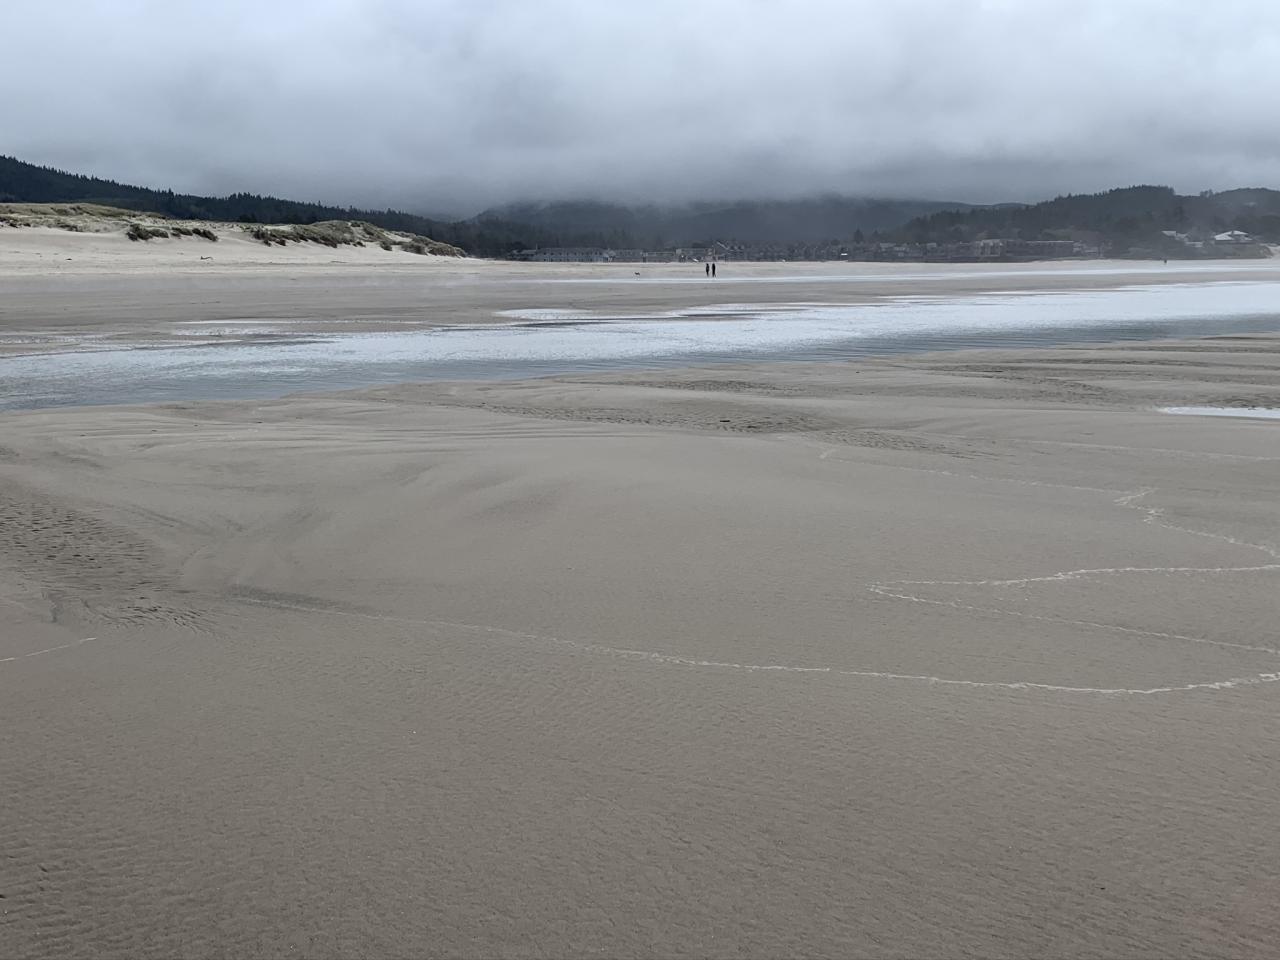 Looking south on Champman Point, sandbars/tidepools